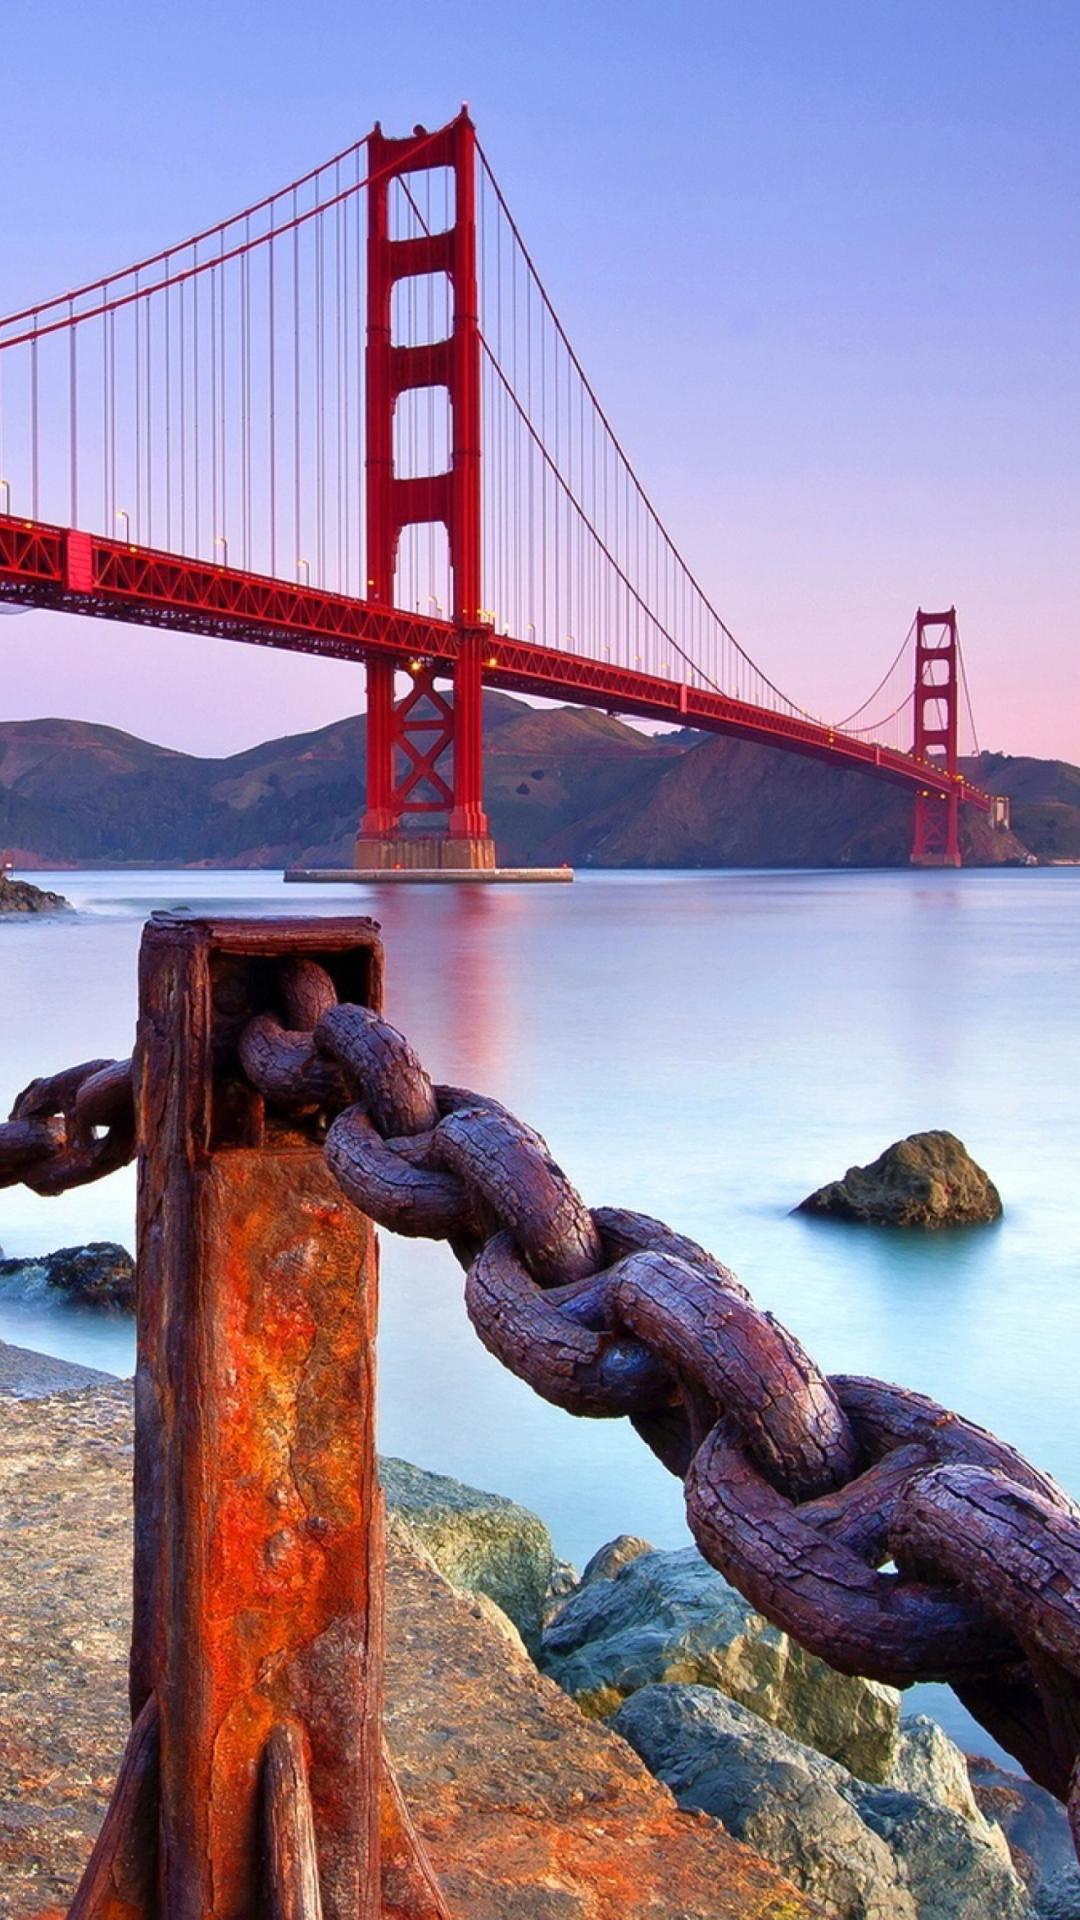 Golden gate bridge san francisco wallpaper for iphone 6 plus - San francisco iphone wallpaper ...